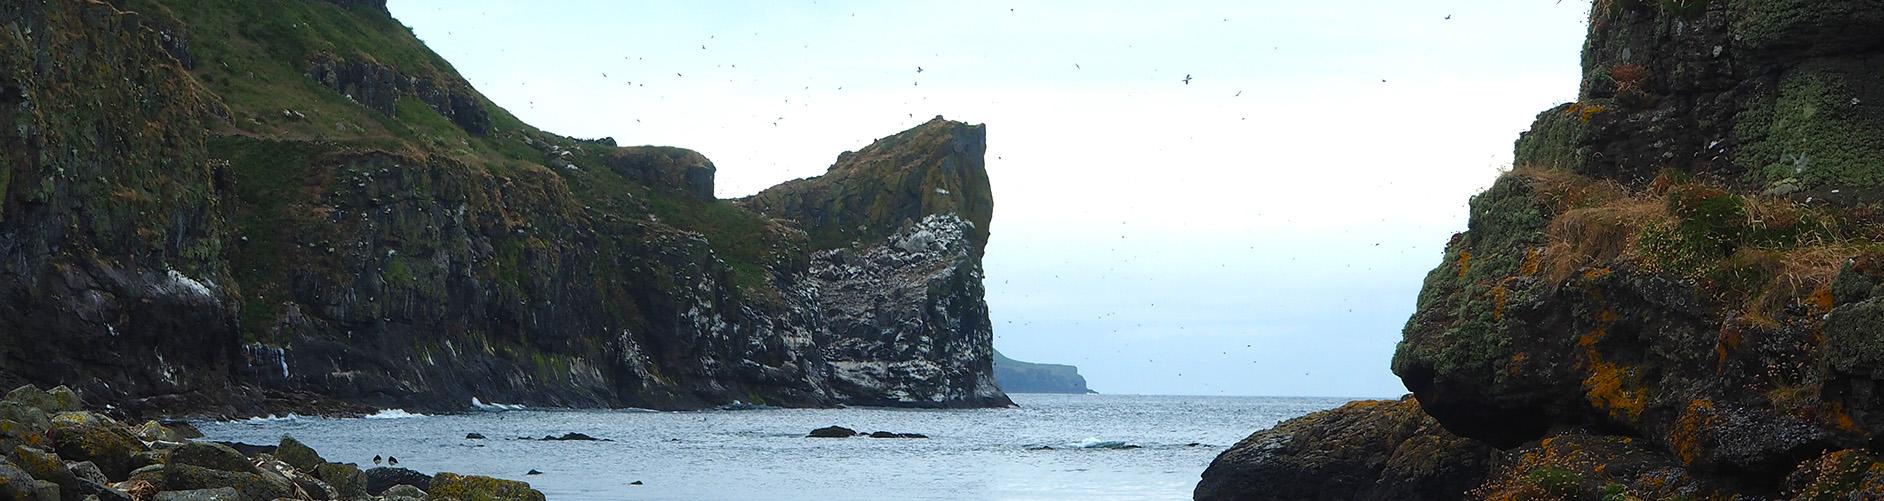 Island of Mull Cruise | Mull | Scotland | Inner Hebrides